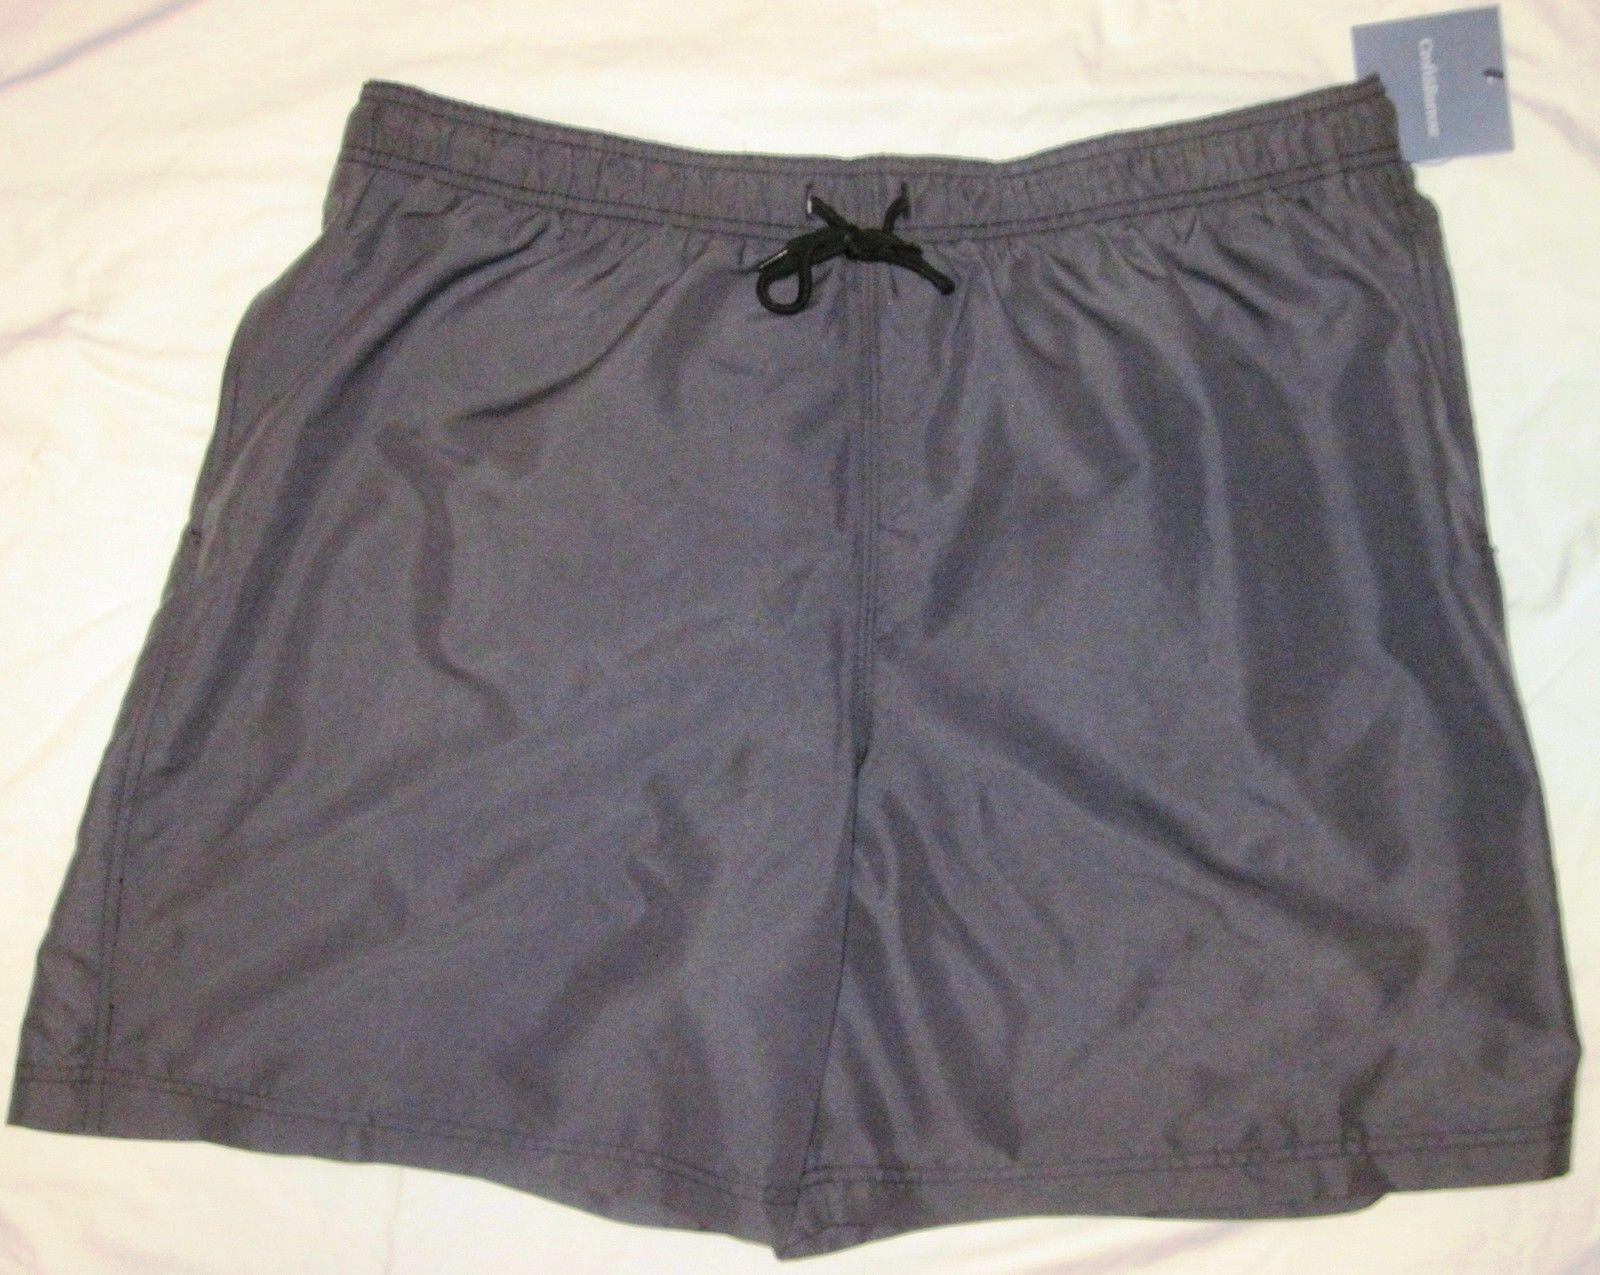 NWT CROFT & BARROW Swim Bathing Suit Trunks Mens XXL black or gray solid Poly image 7